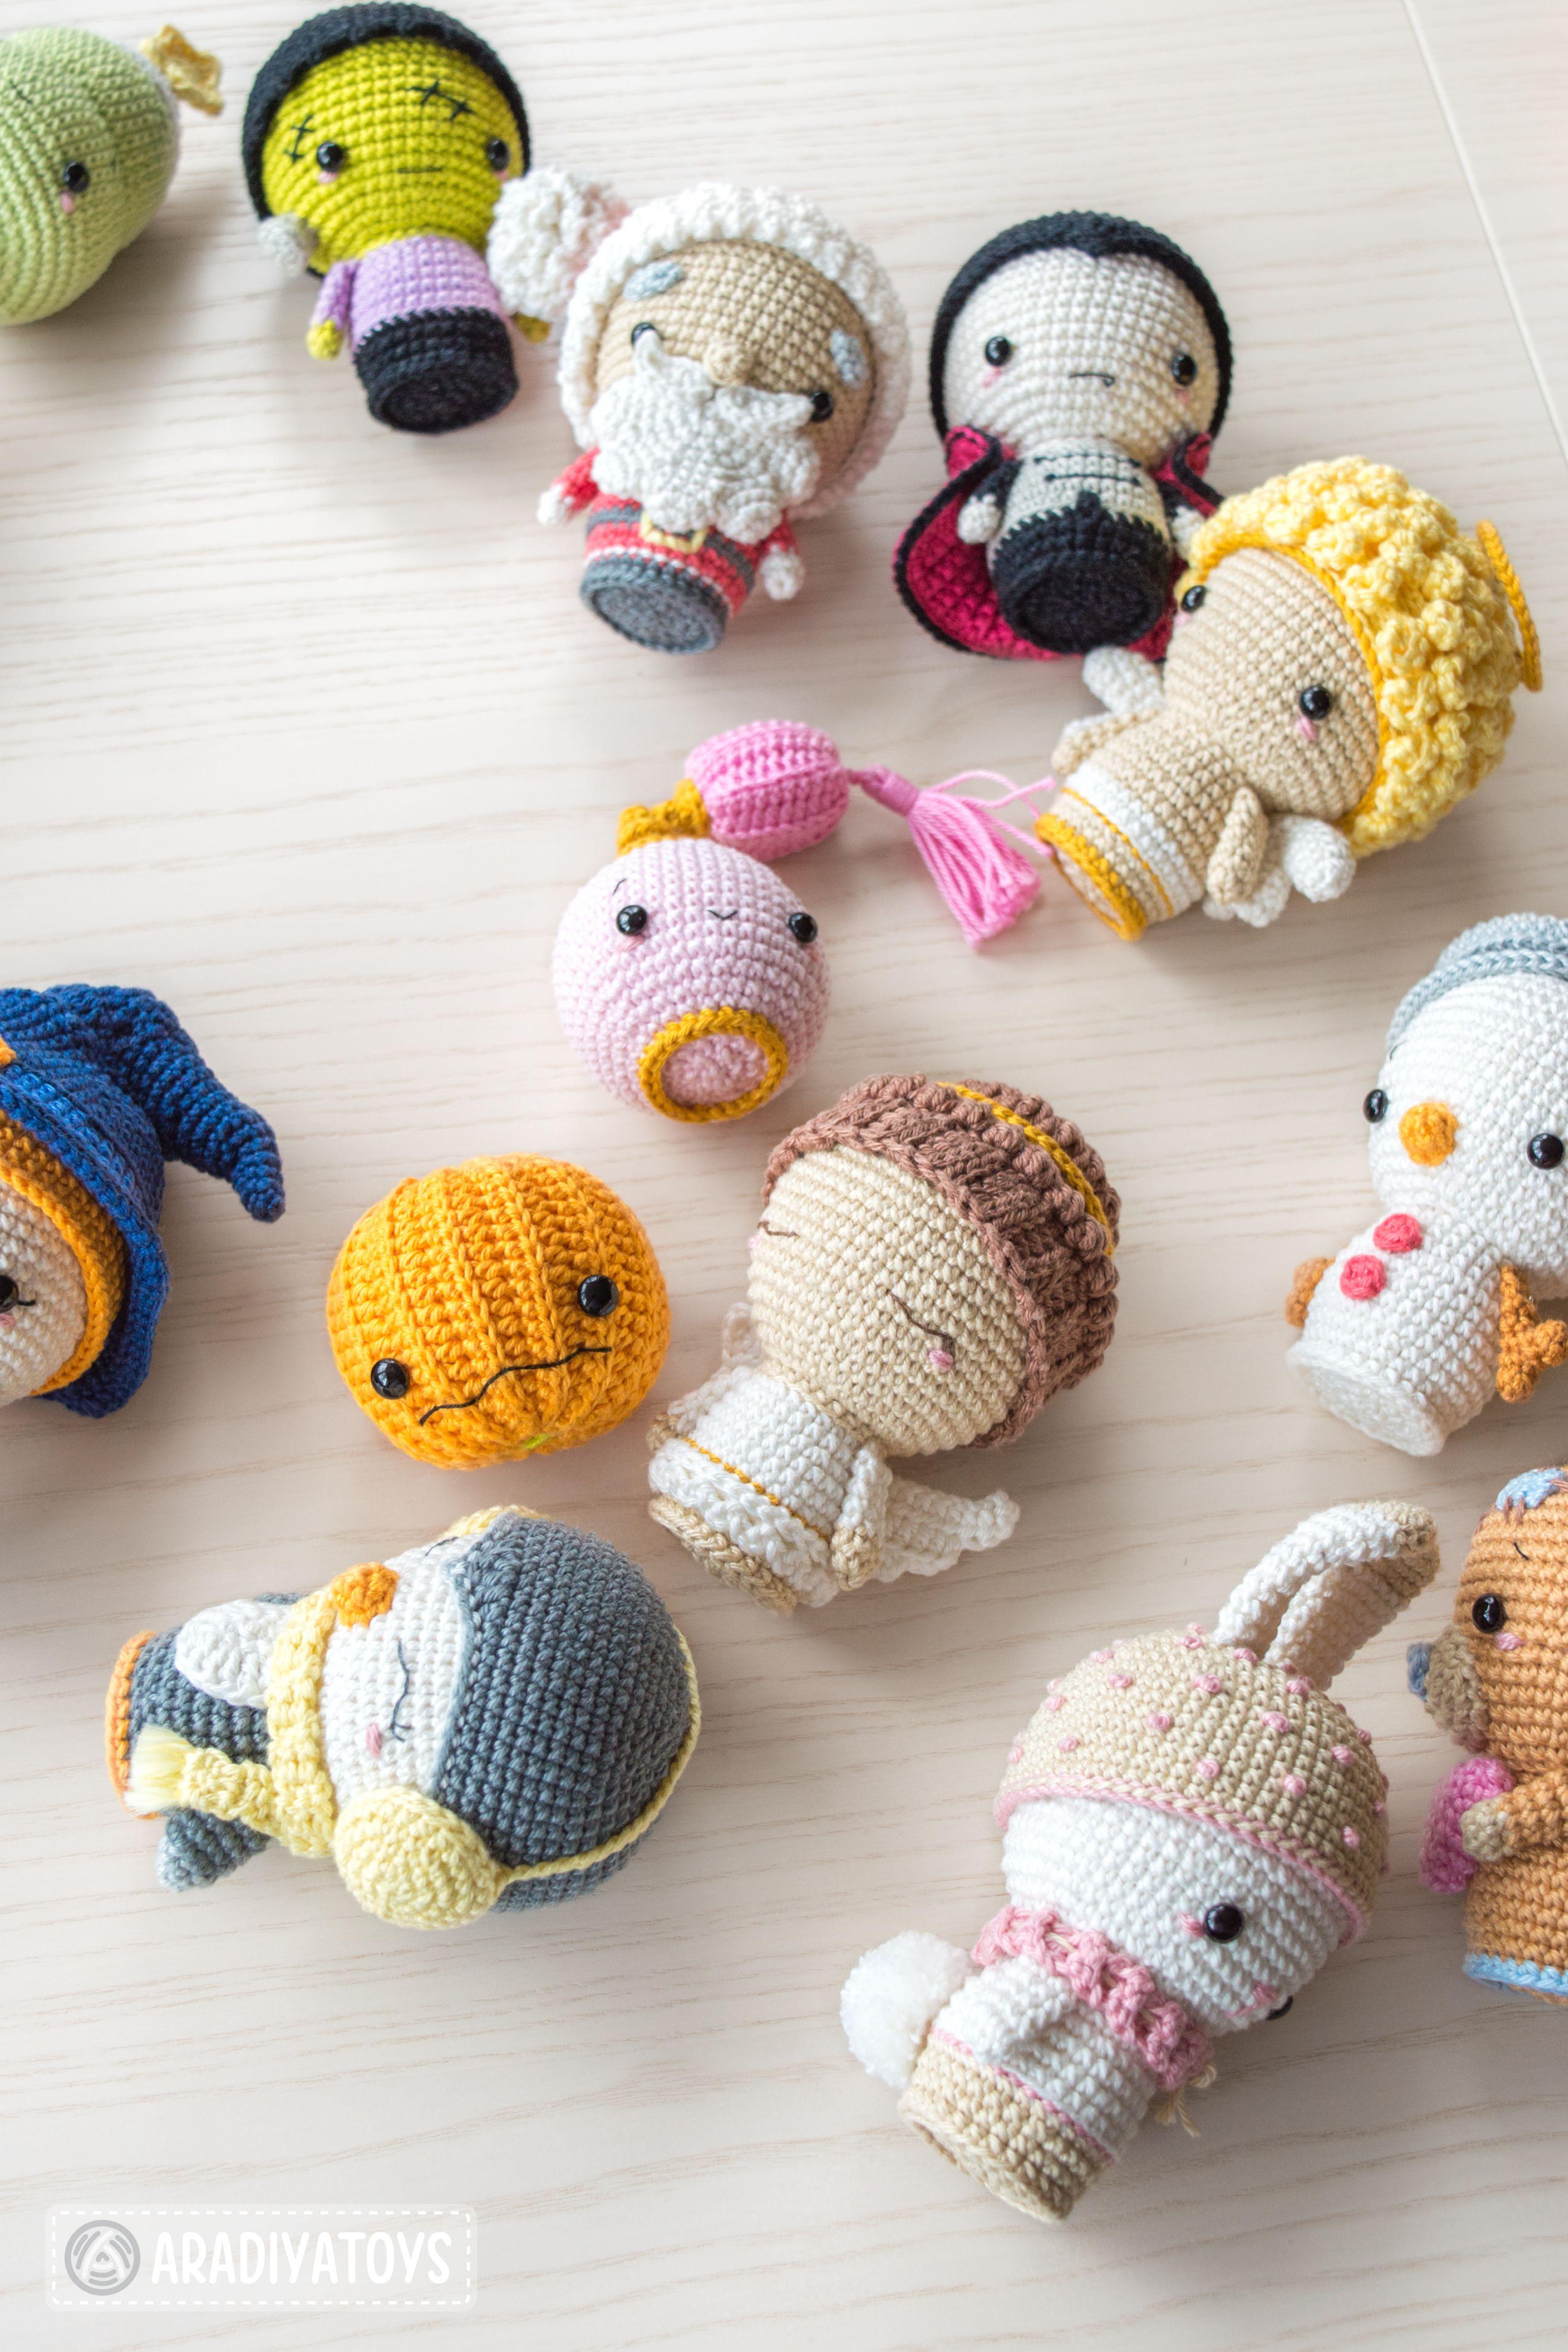 doll-butterfly crochet pattern CROCHET PATTERN set English PDF lambsheep crochet pattern